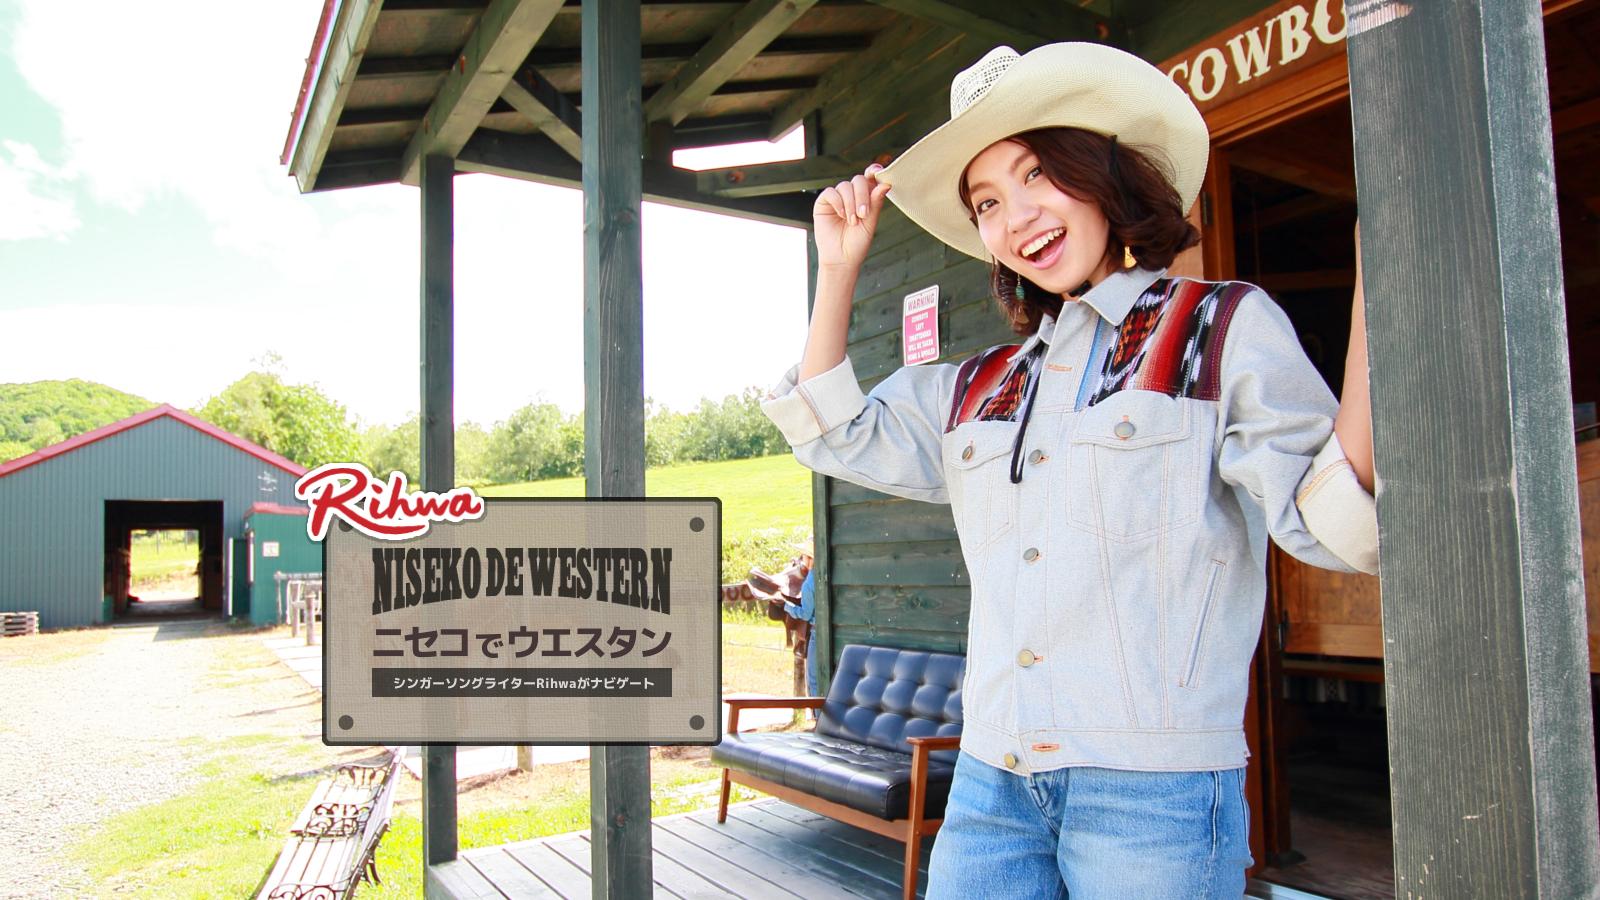 Rihwaが行く!ニセコでウエスタン乗馬&ビッグバーガー&スイーツ旅